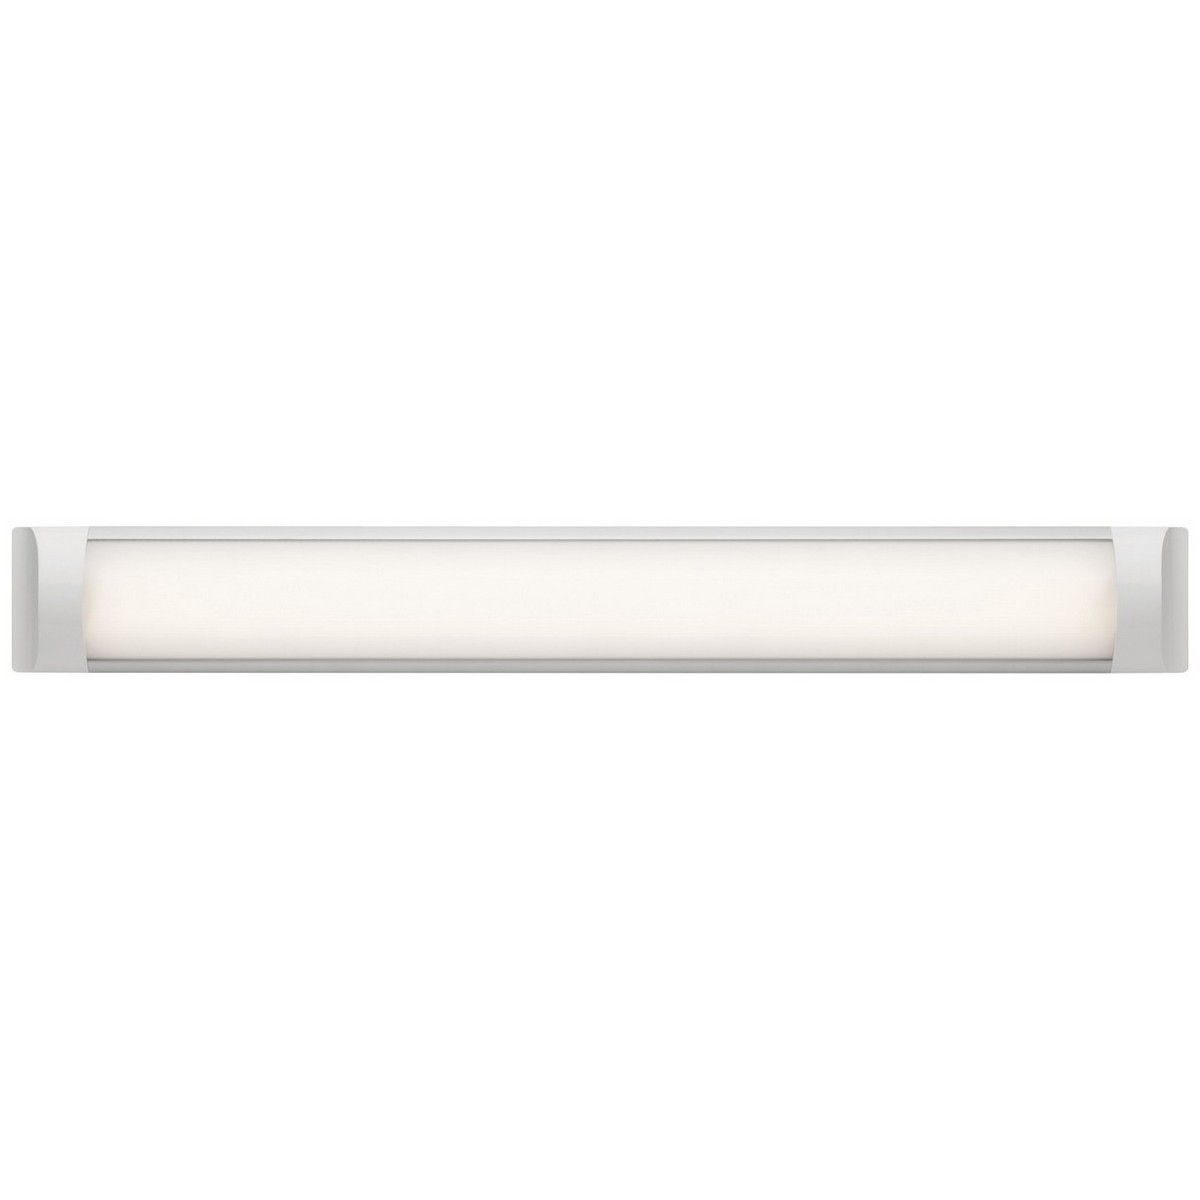 Neo LED Batten Fix Ceiling Light, 28W / 6000K